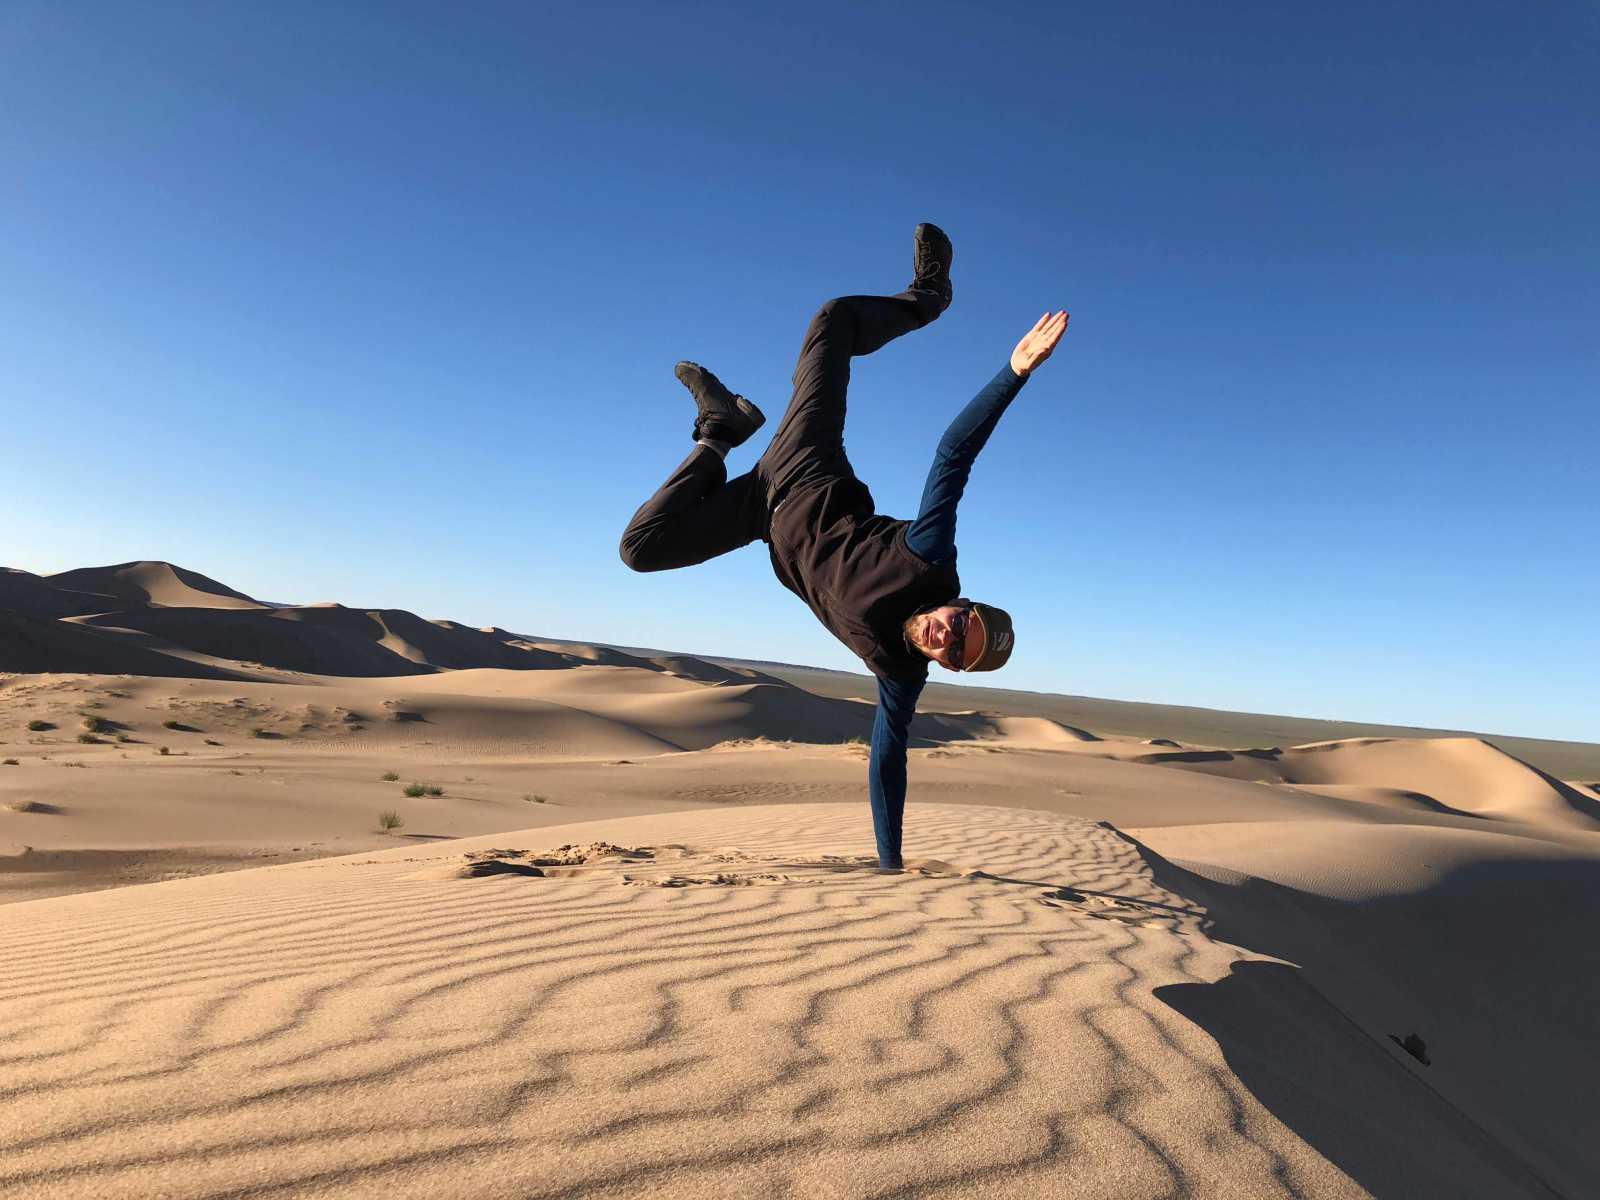 Having fun on the Gobi Sand Dunes